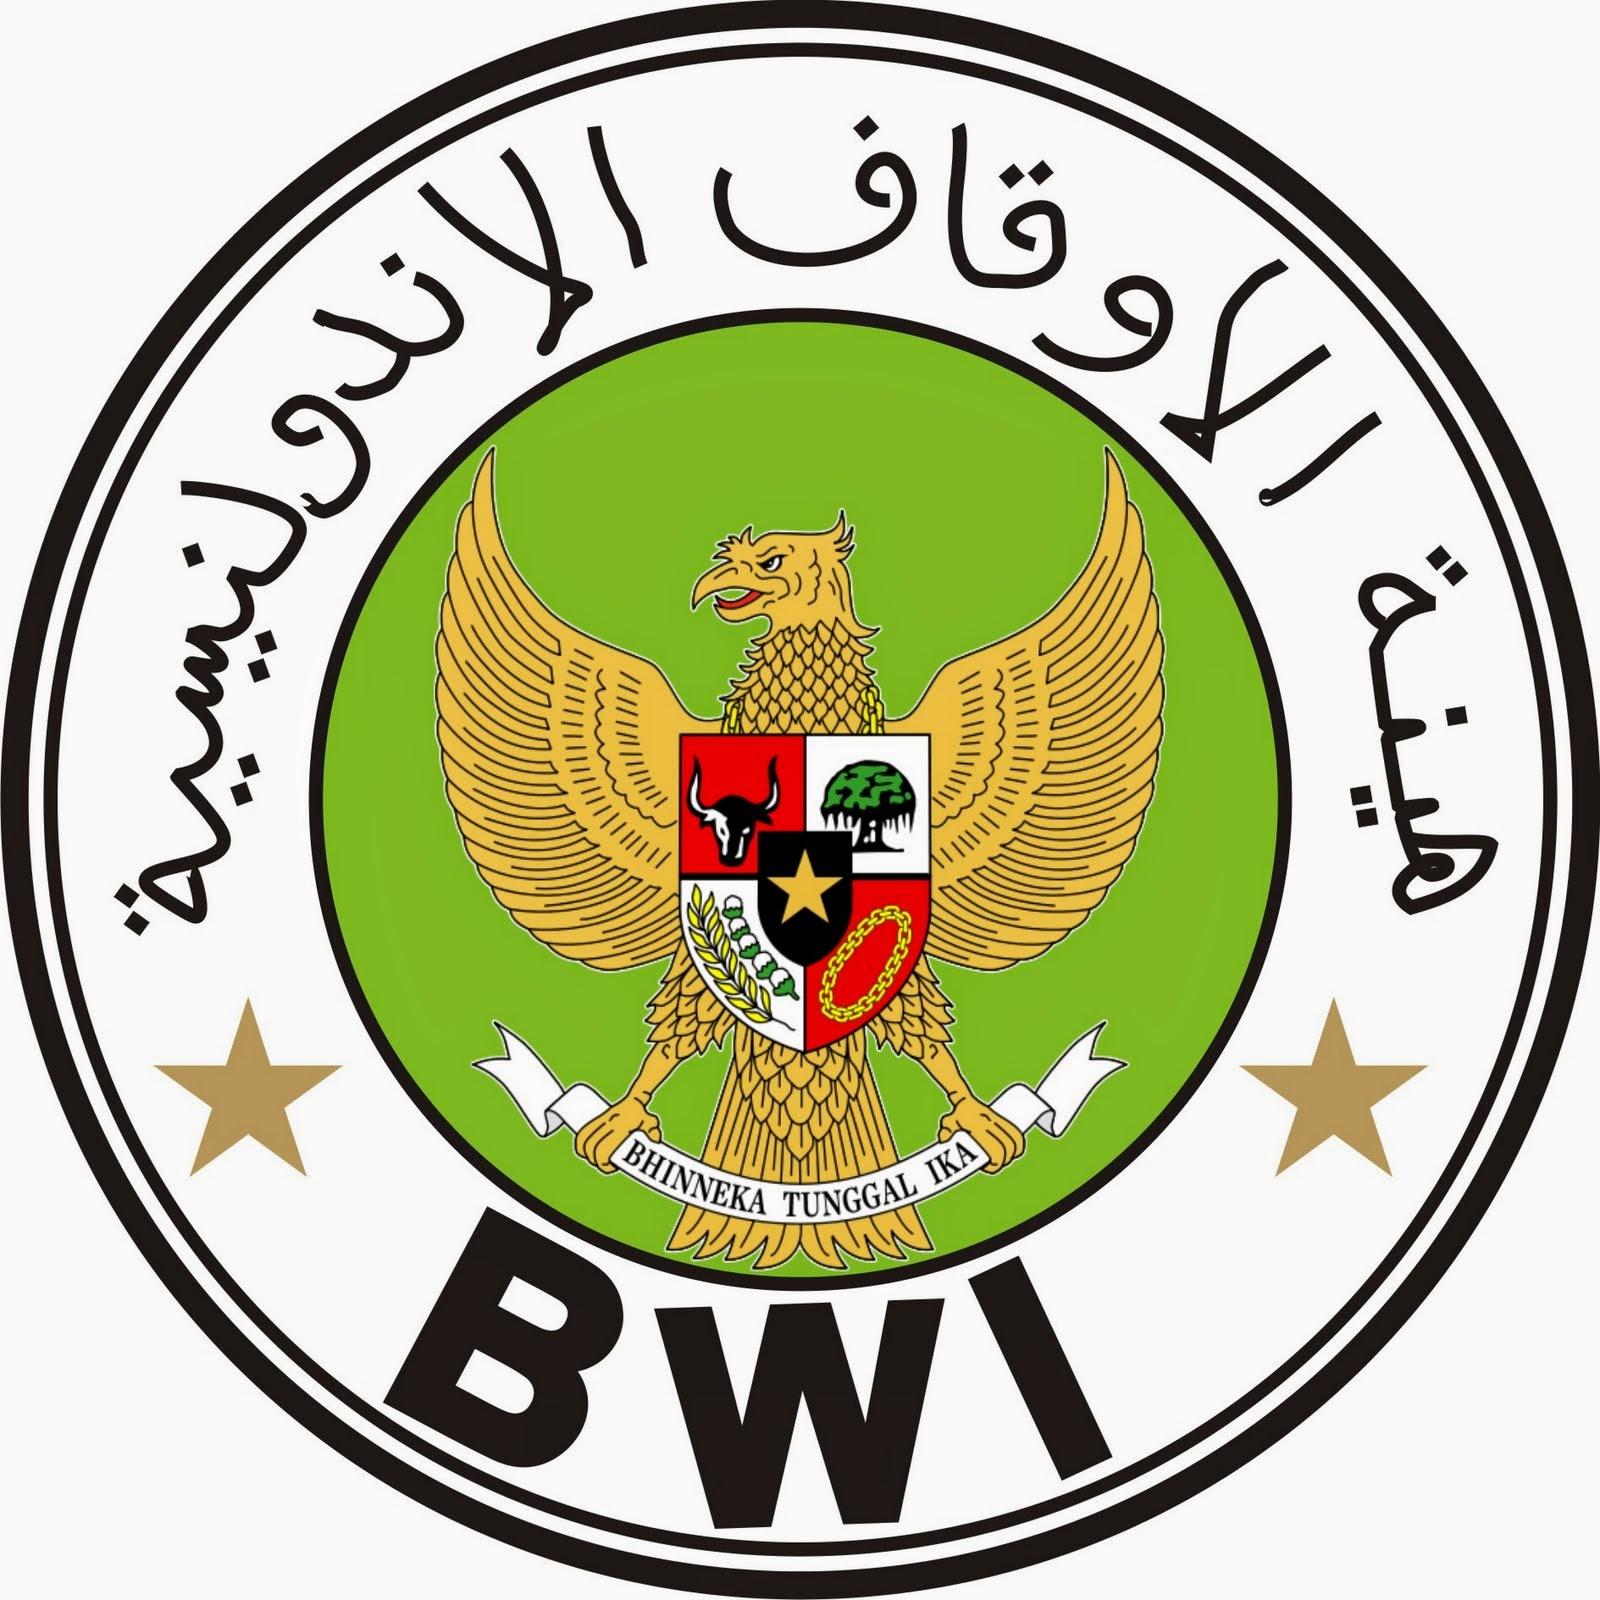 Badan Waqaf Indonesia,BWI